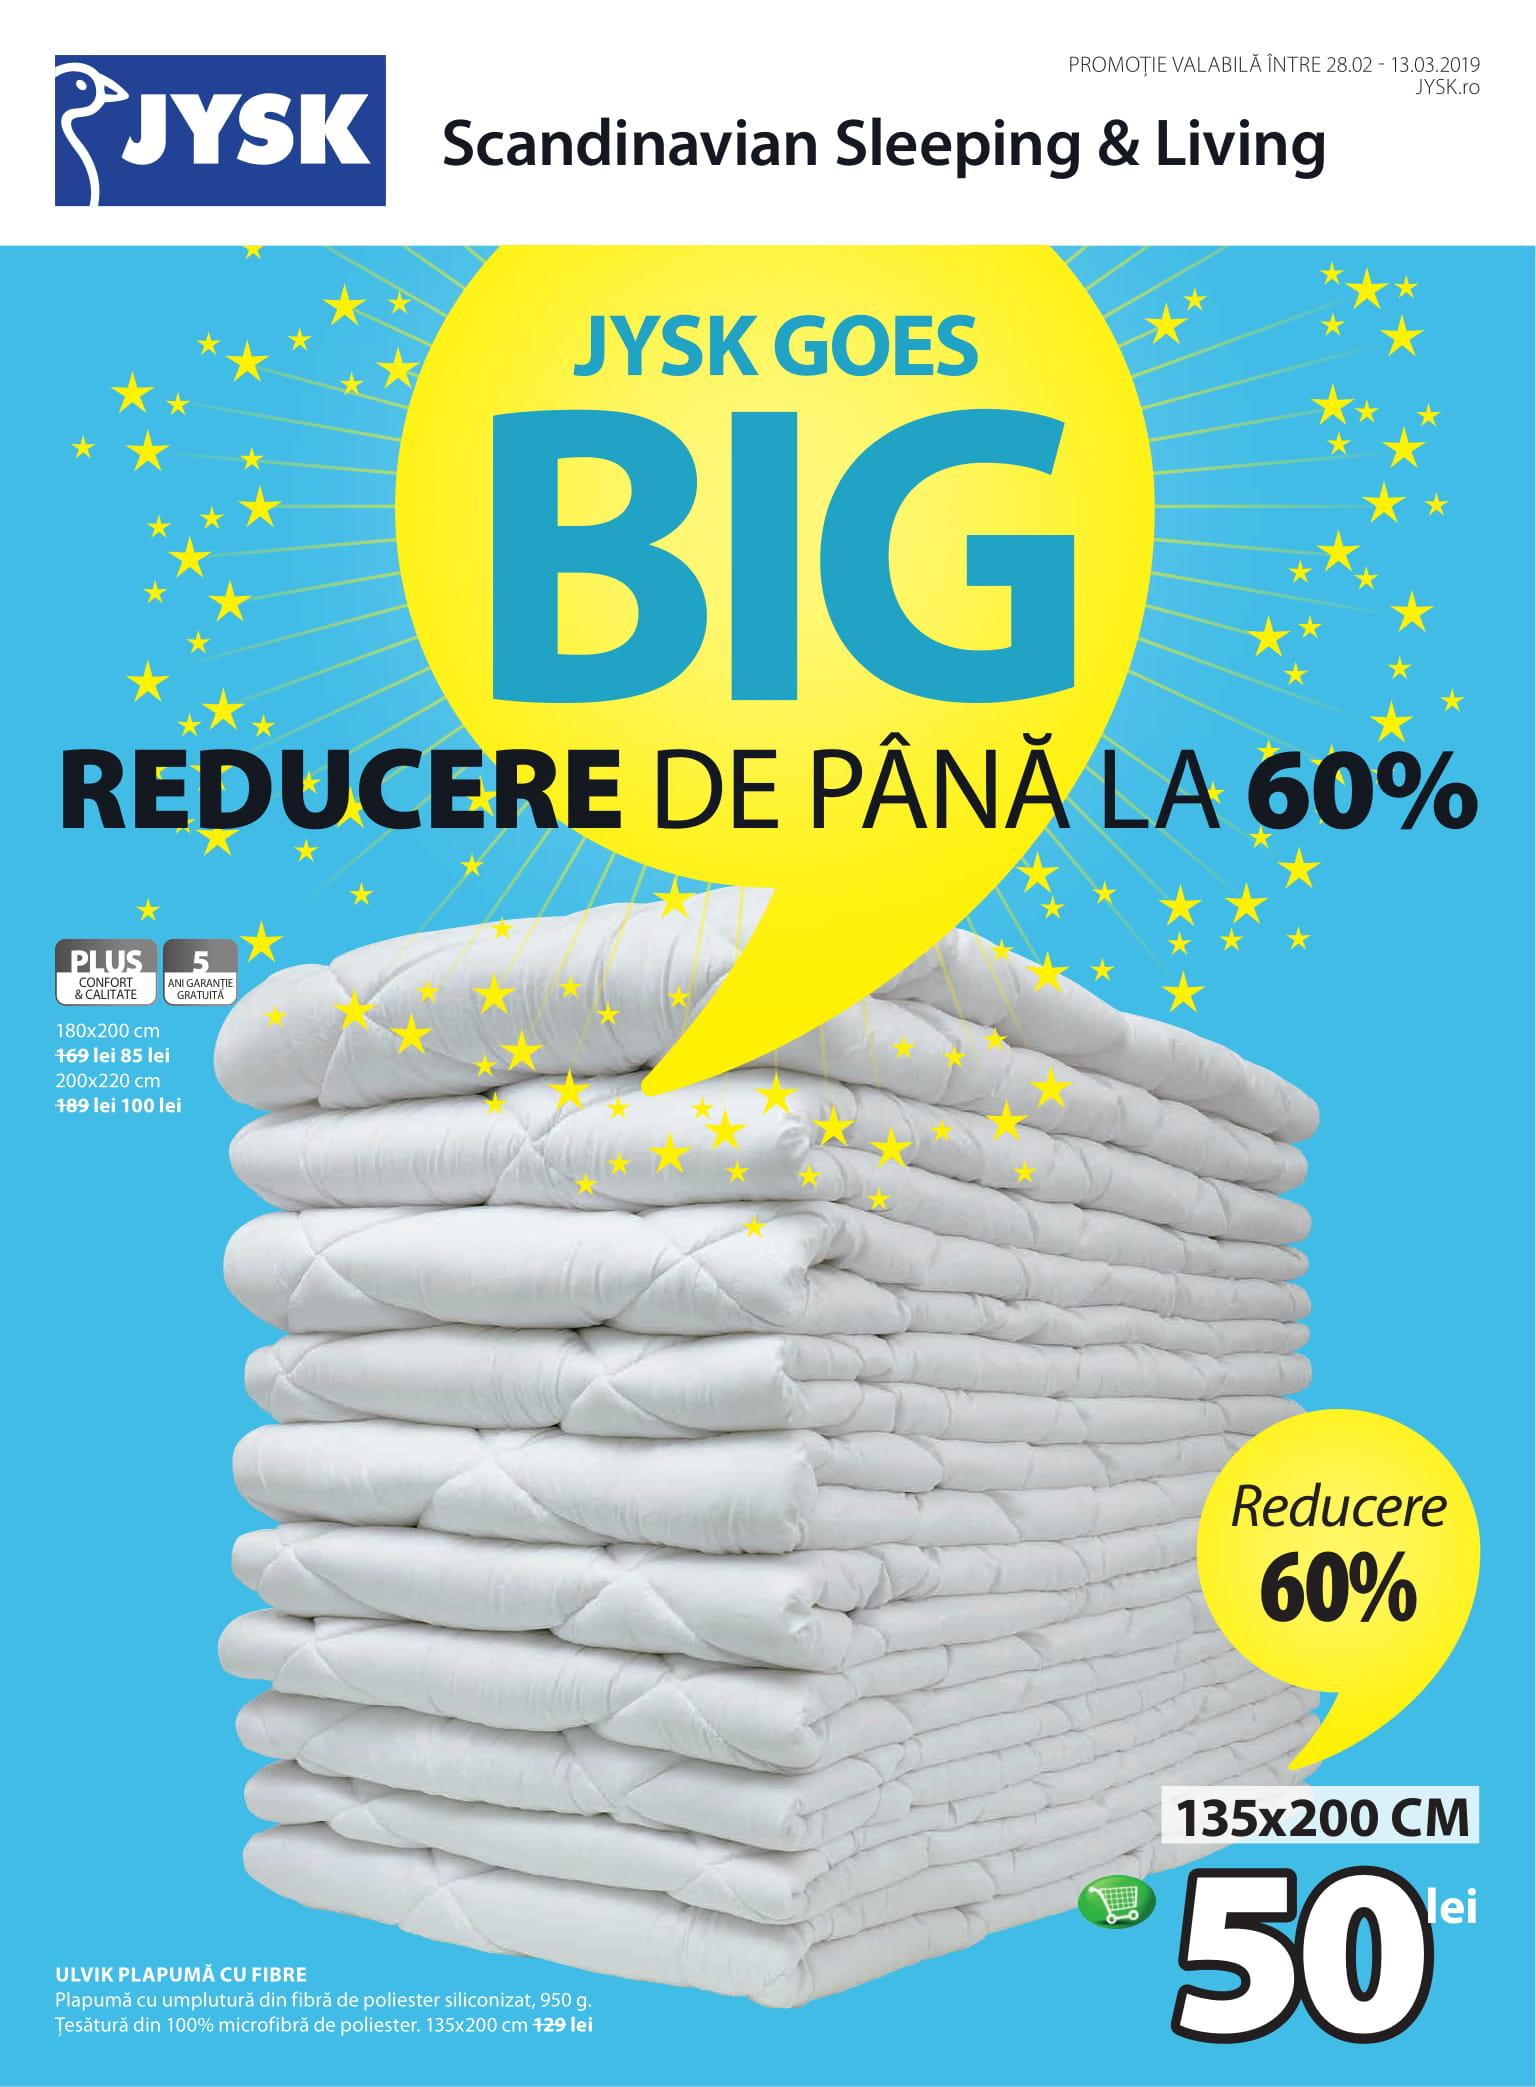 site de renume disponibilitate Marea Britanie 100% calitate JYSK Goes Big | Reduceri de până la 60% - Shopping City Targu Jiu